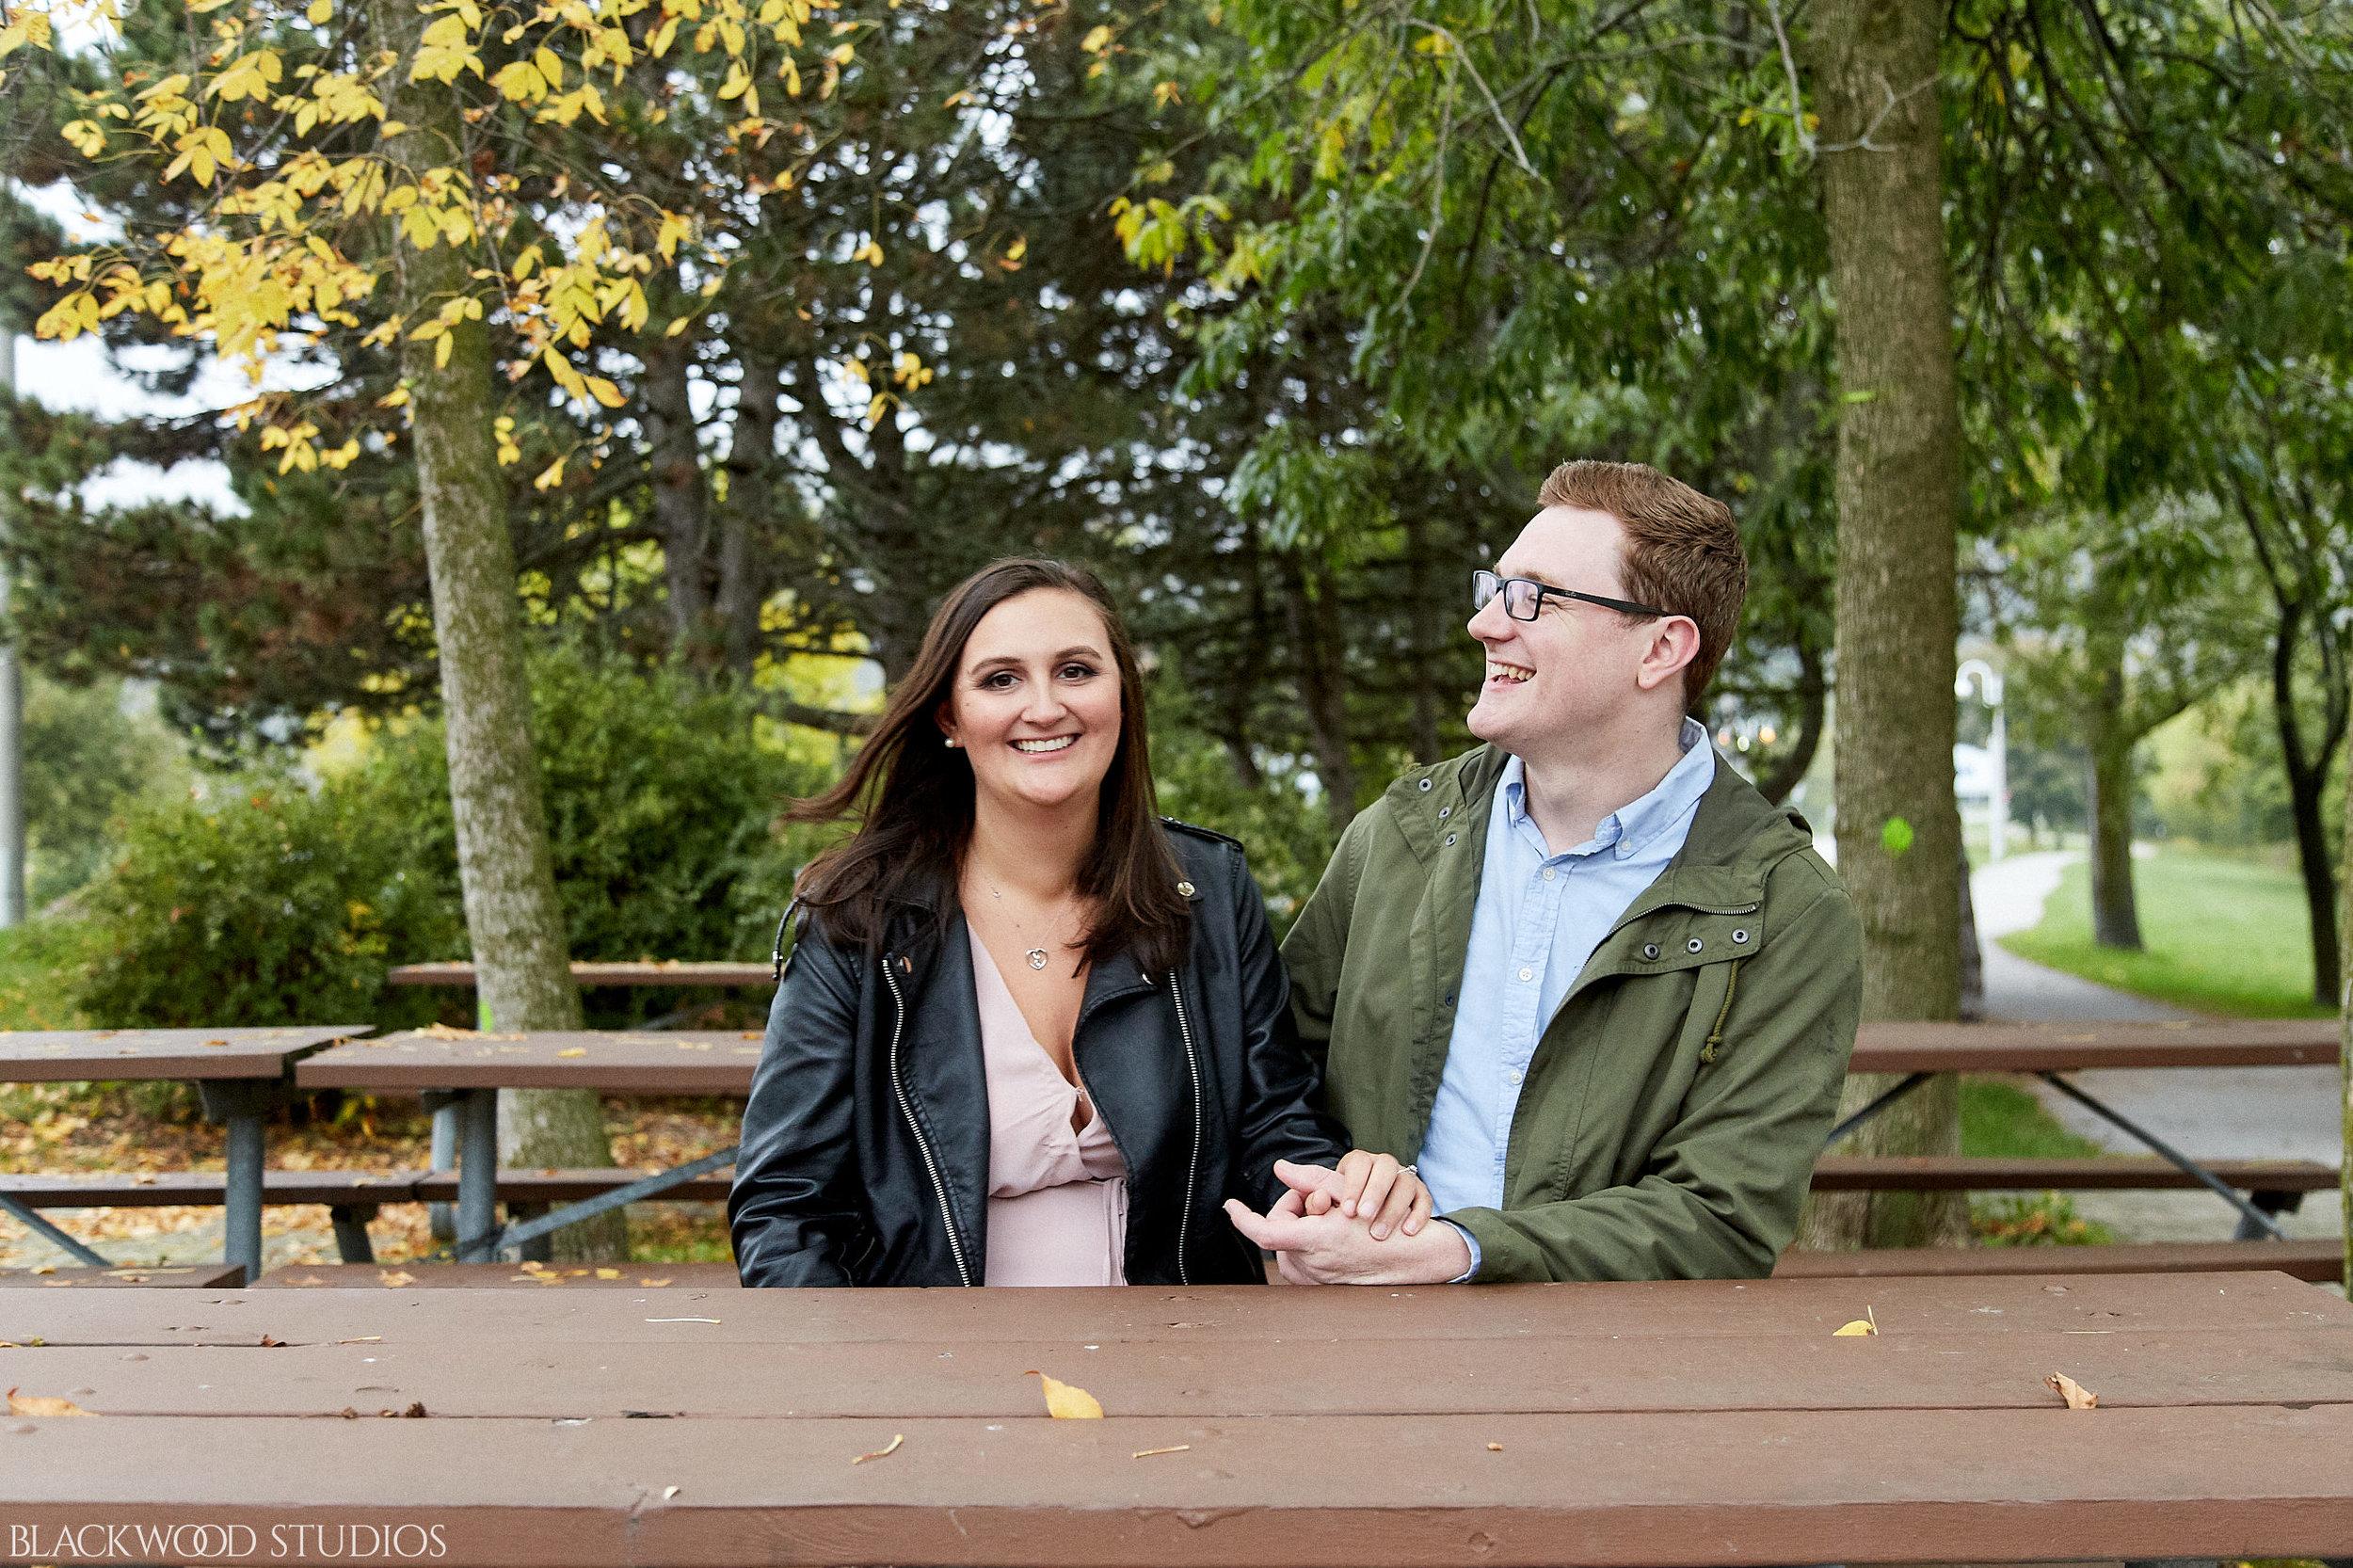 Blackwood-Studios-20181008-18-21-15-Justin-and-Samantha-Engagement-Photography-foggy-Scaraborough-Bluffs-Park-Ontario.jpg